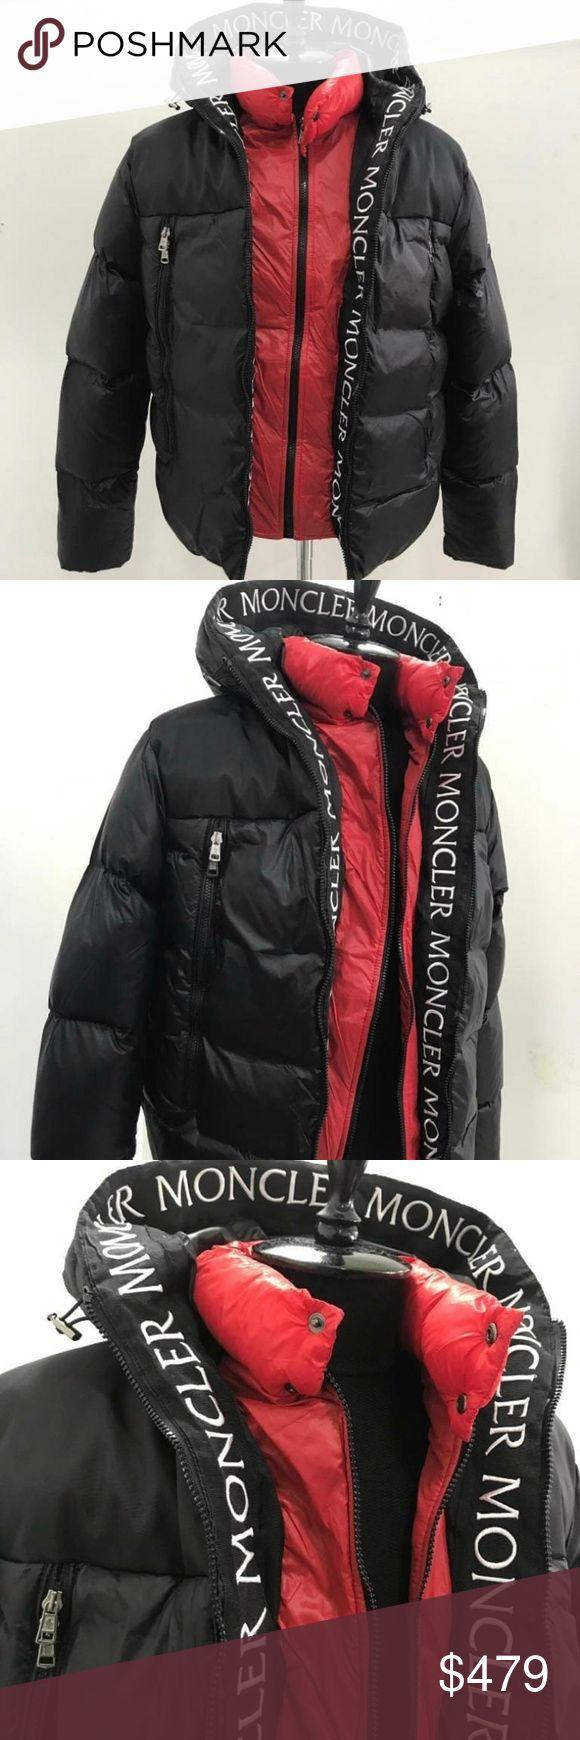 Moncler Men's Jacket Nwt Casual Medium Moncler Men's